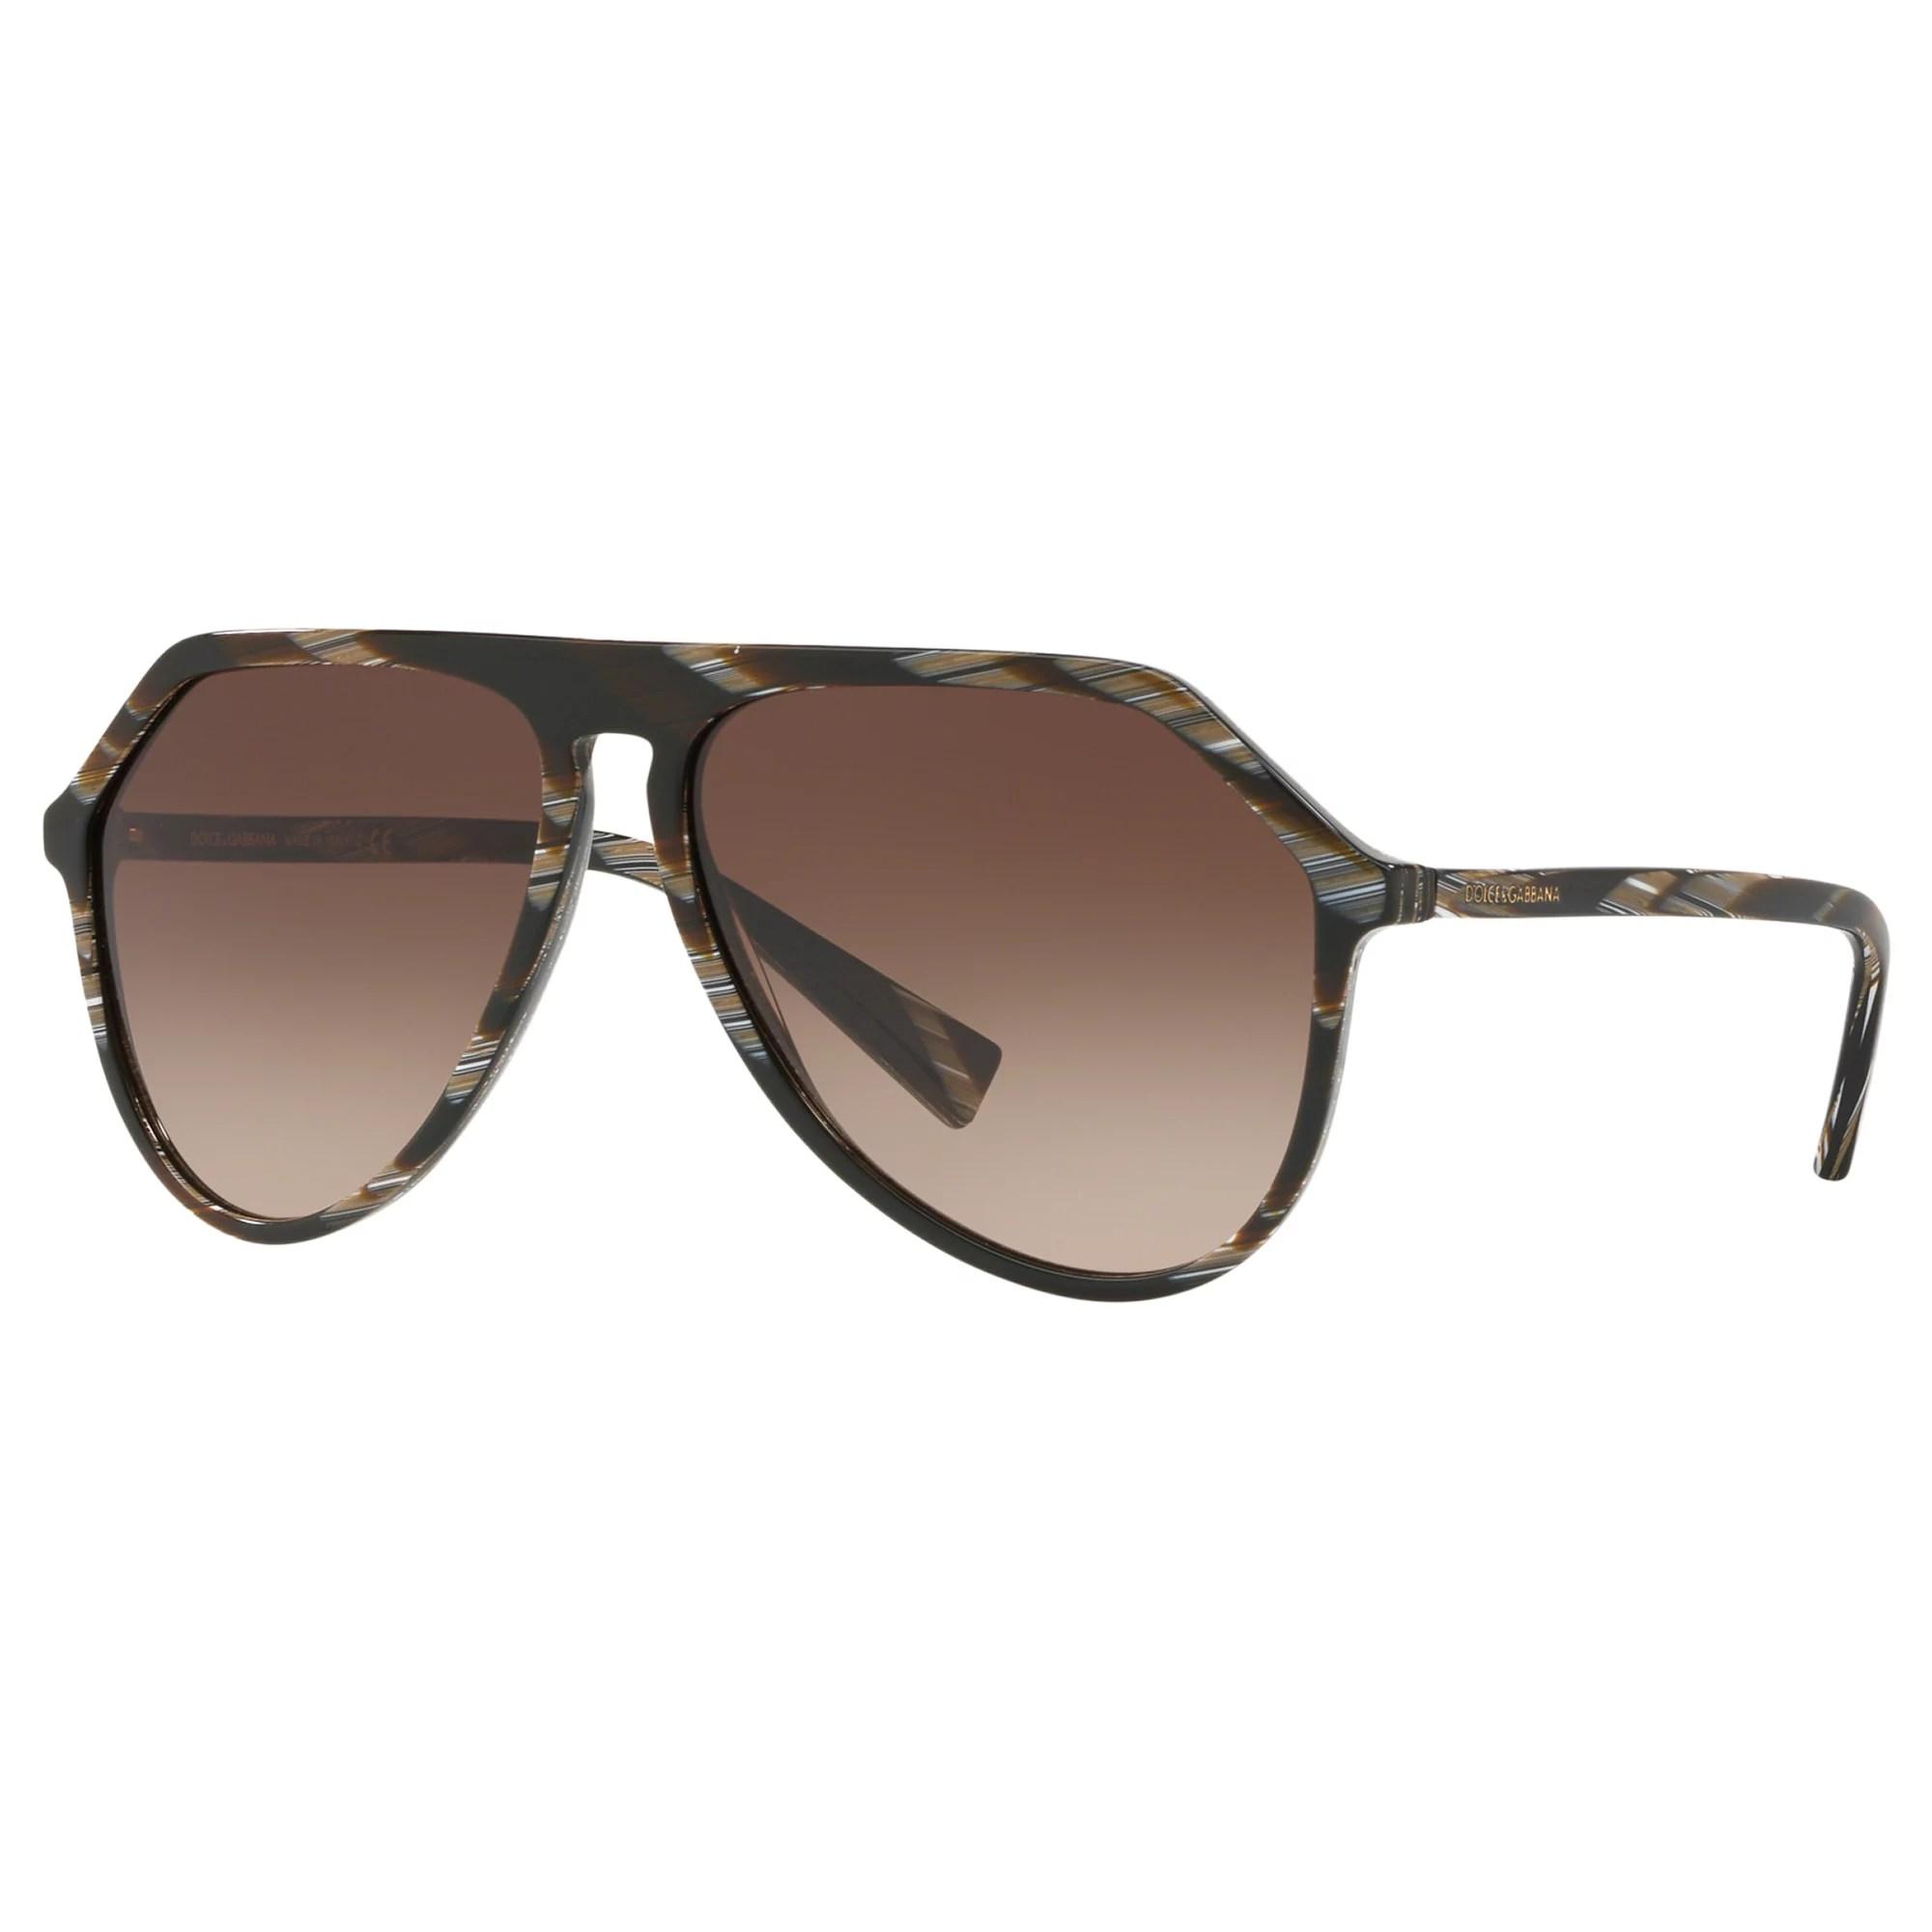 Dolce & Gabbana Dg4341 Men' Aviator Sunglasses Brown